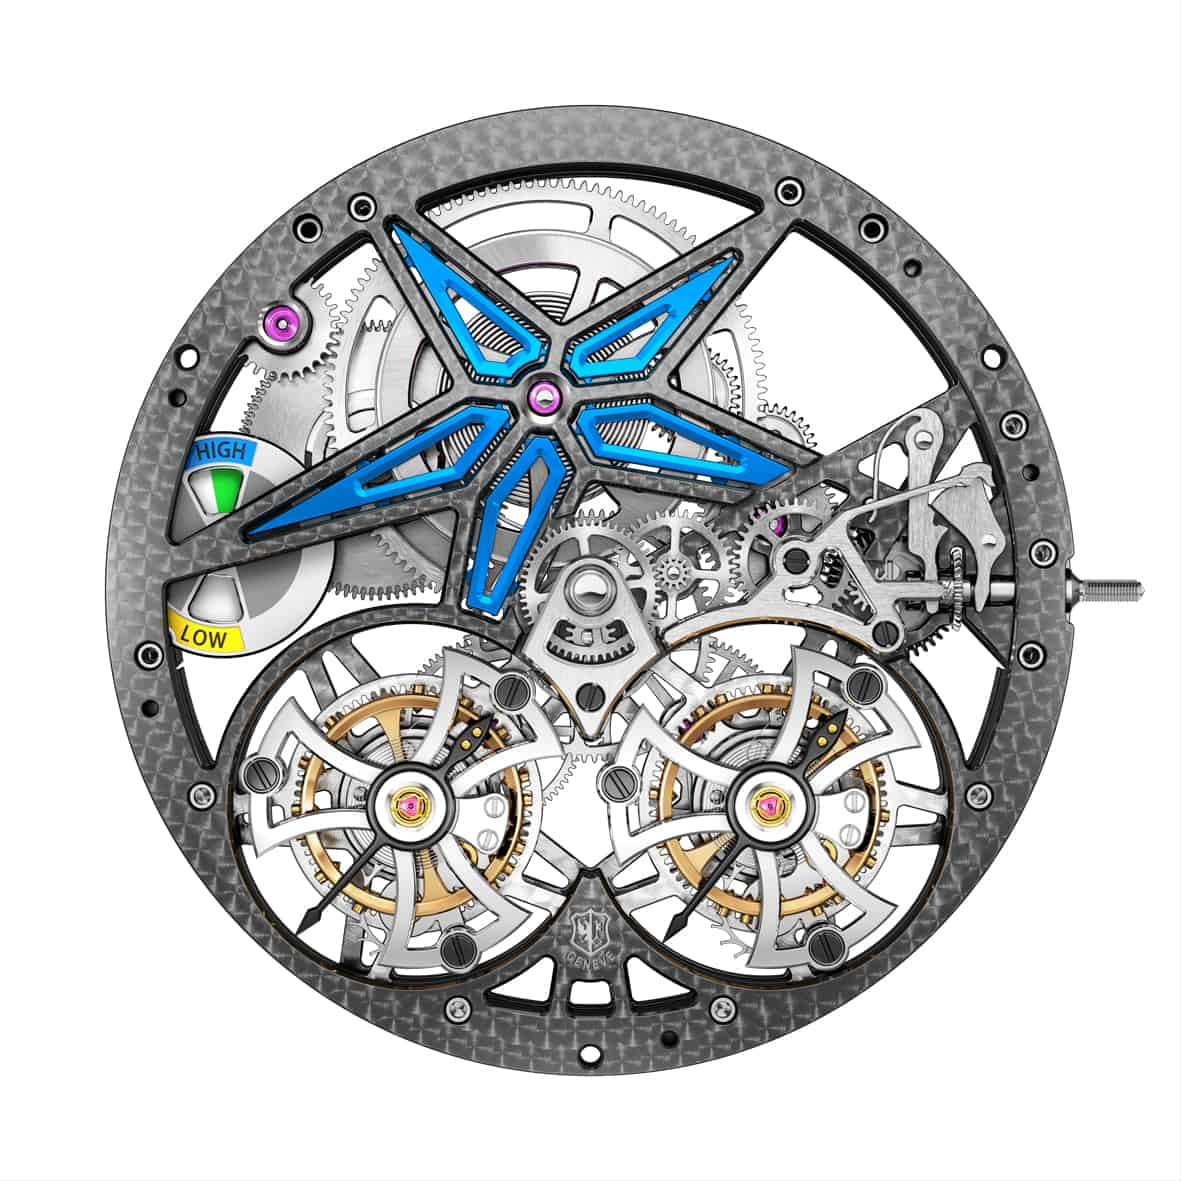 Roger Dubuis Excalibur Pirelli Doppeltourbillon Kaliber RD105SQ